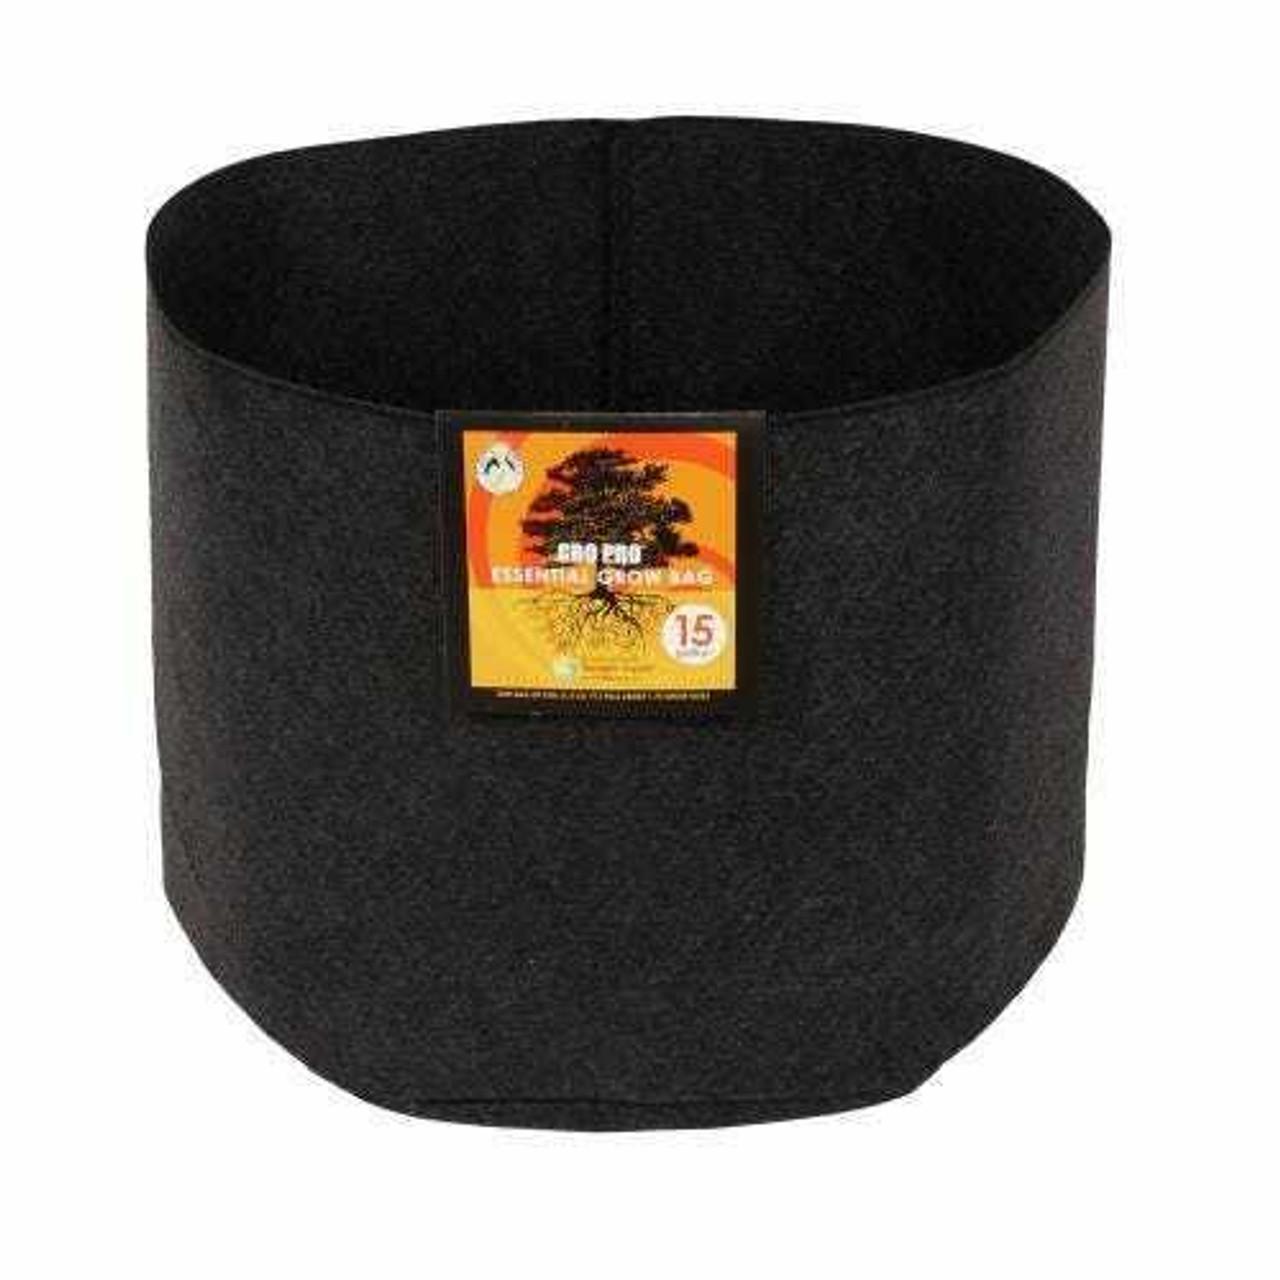 Gro Pro Essential Round Fabric Pot - Black 15 Gallon - 1